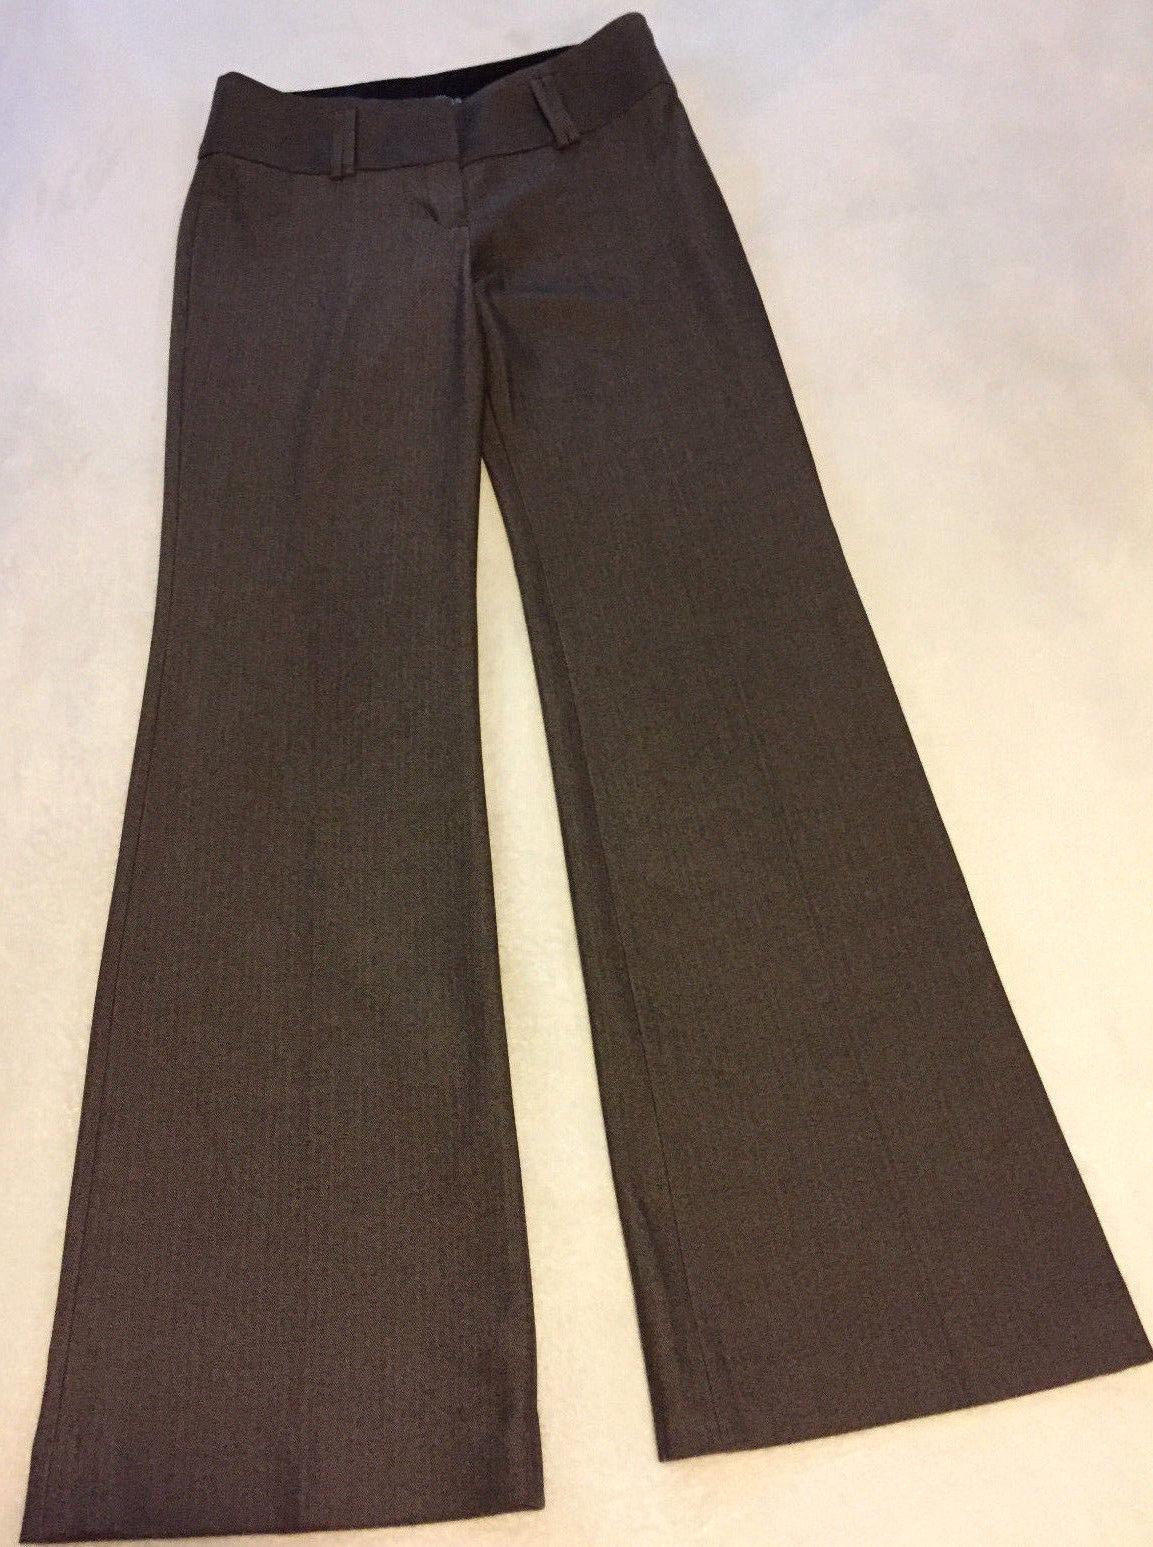 Express Editor Women Career Work Trouser Dress Pants Size 2 R - $23.99